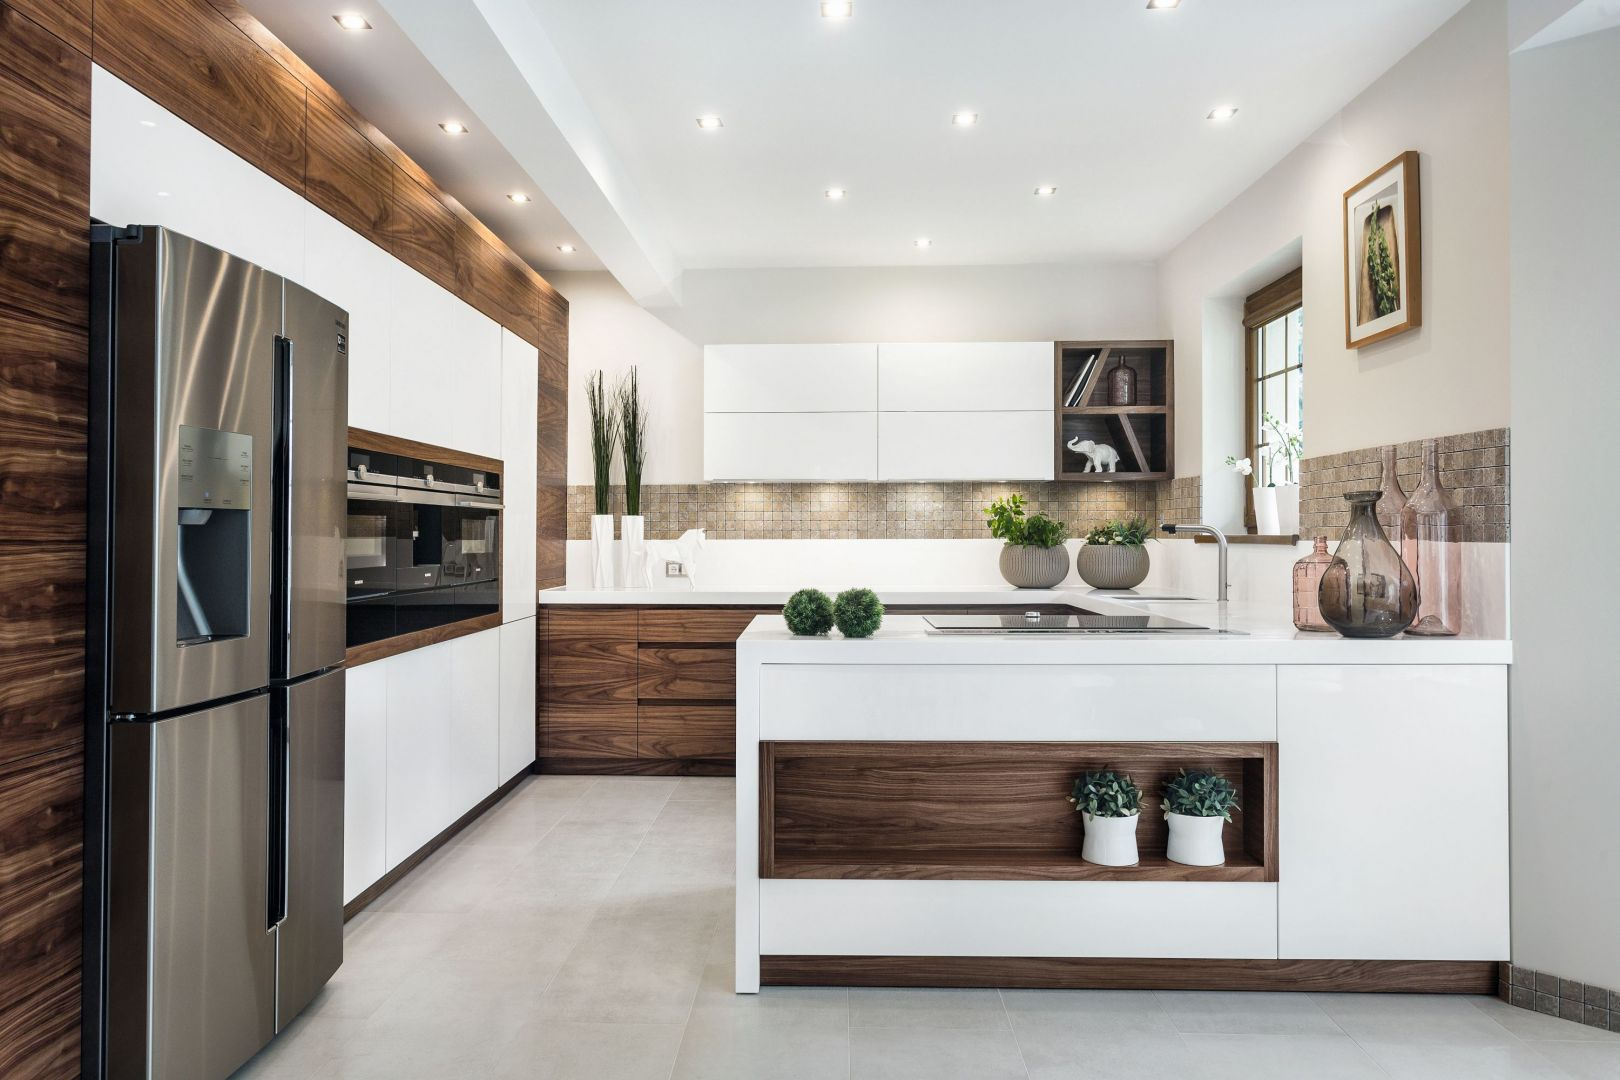 Trendy 2018: drewno w kuchni. Projekt Vigo. Fot. Artur Krupa.